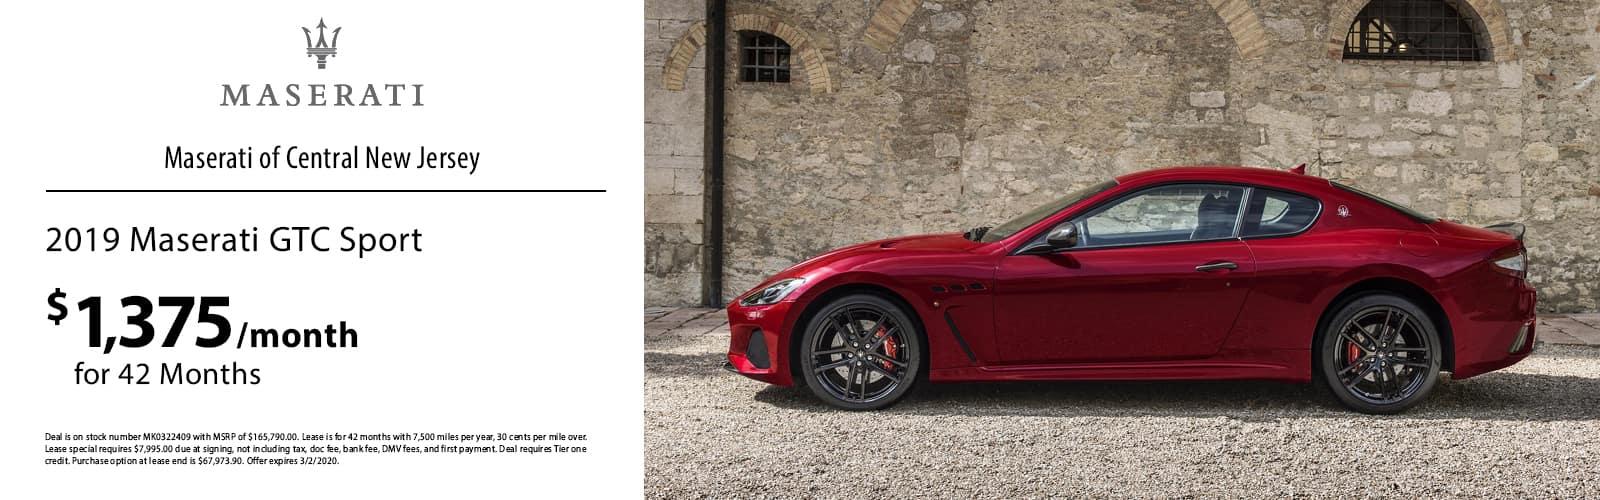 Maserati GTC Sport